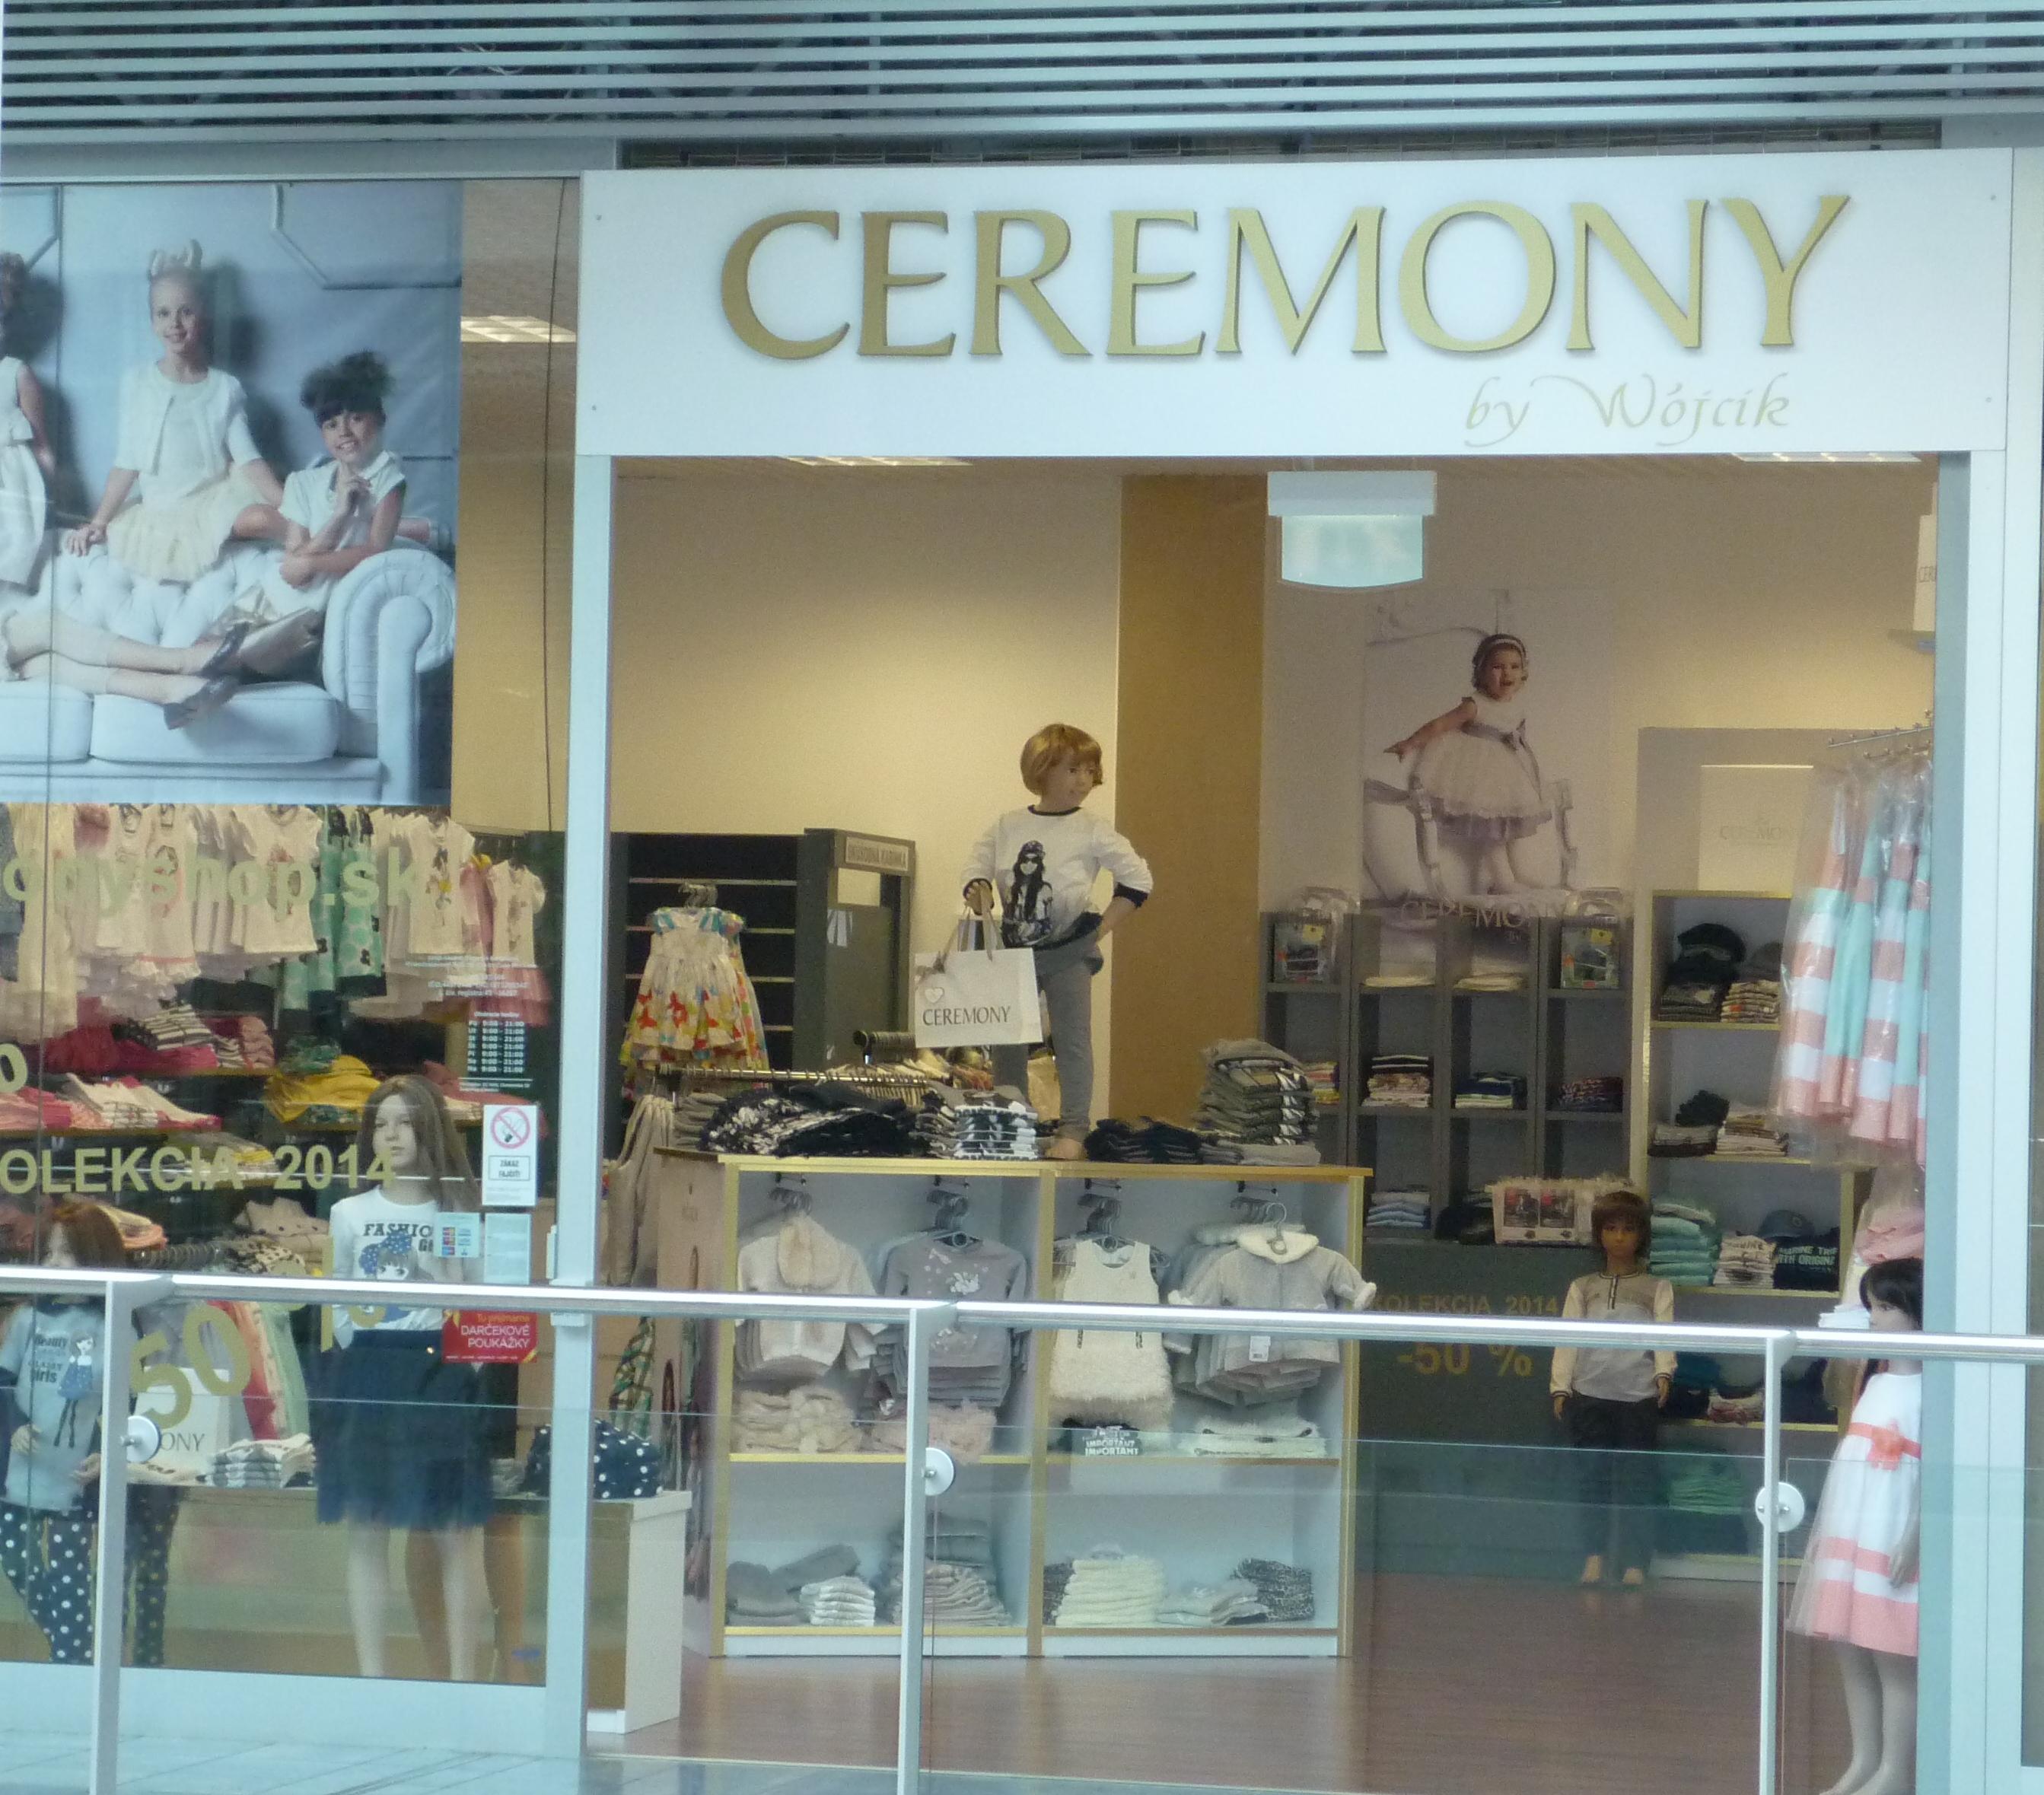 obchod s detskou módou CEREMONY by Wojcik